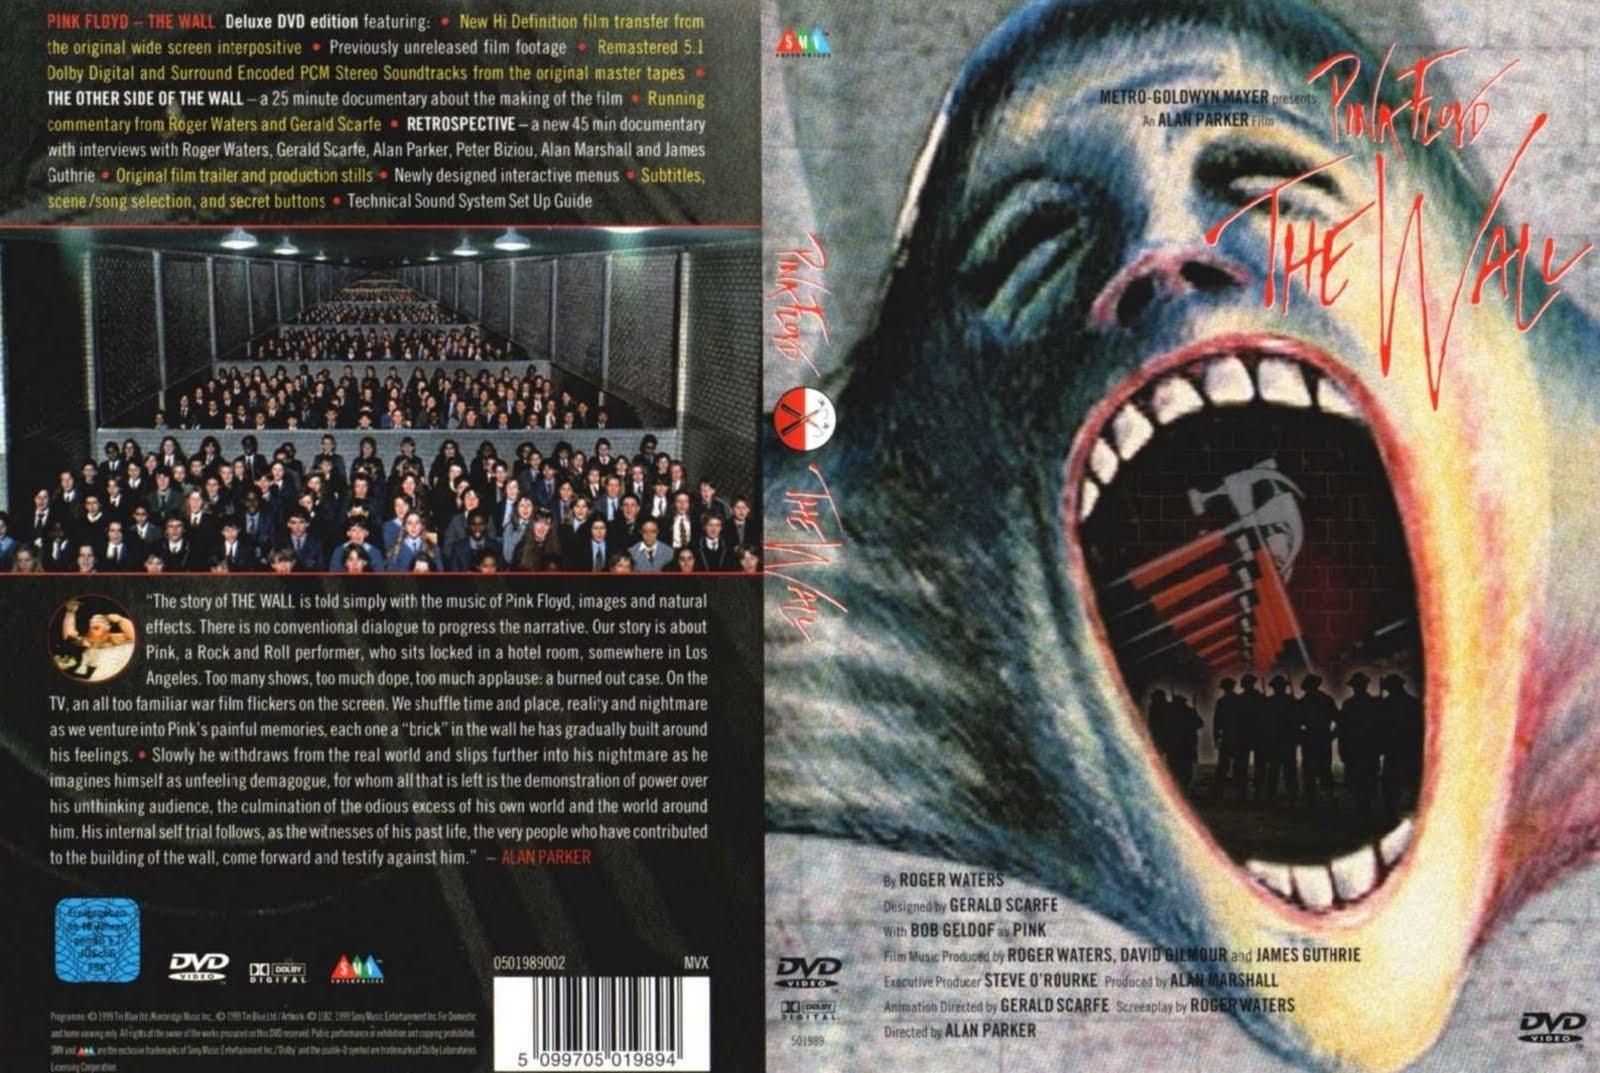 http://1.bp.blogspot.com/-sQA3QY7ALFQ/Tas0kWHqtqI/AAAAAAAAHcQ/XNwqFODDH2o/s1600/Pink+Floyd+-+The+Wall+-+Cover.jpg